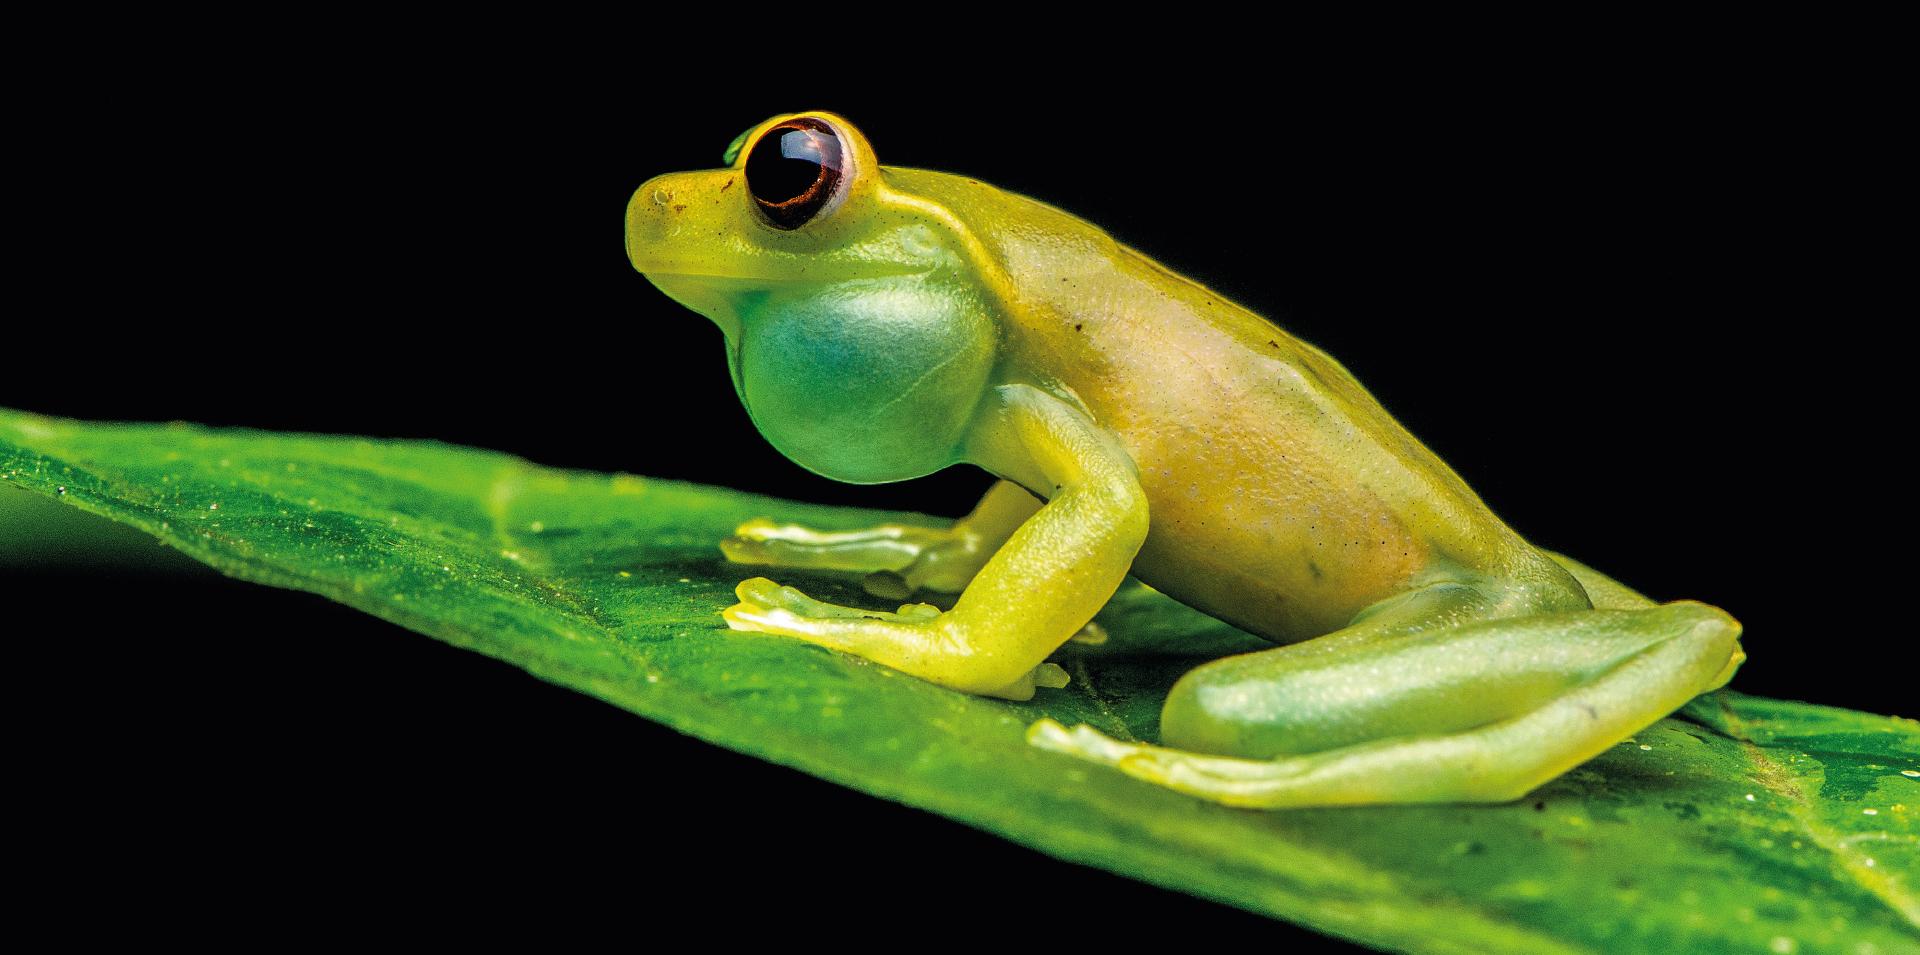 Mashpi's Glass Frog: One of Ecuador's endemic species